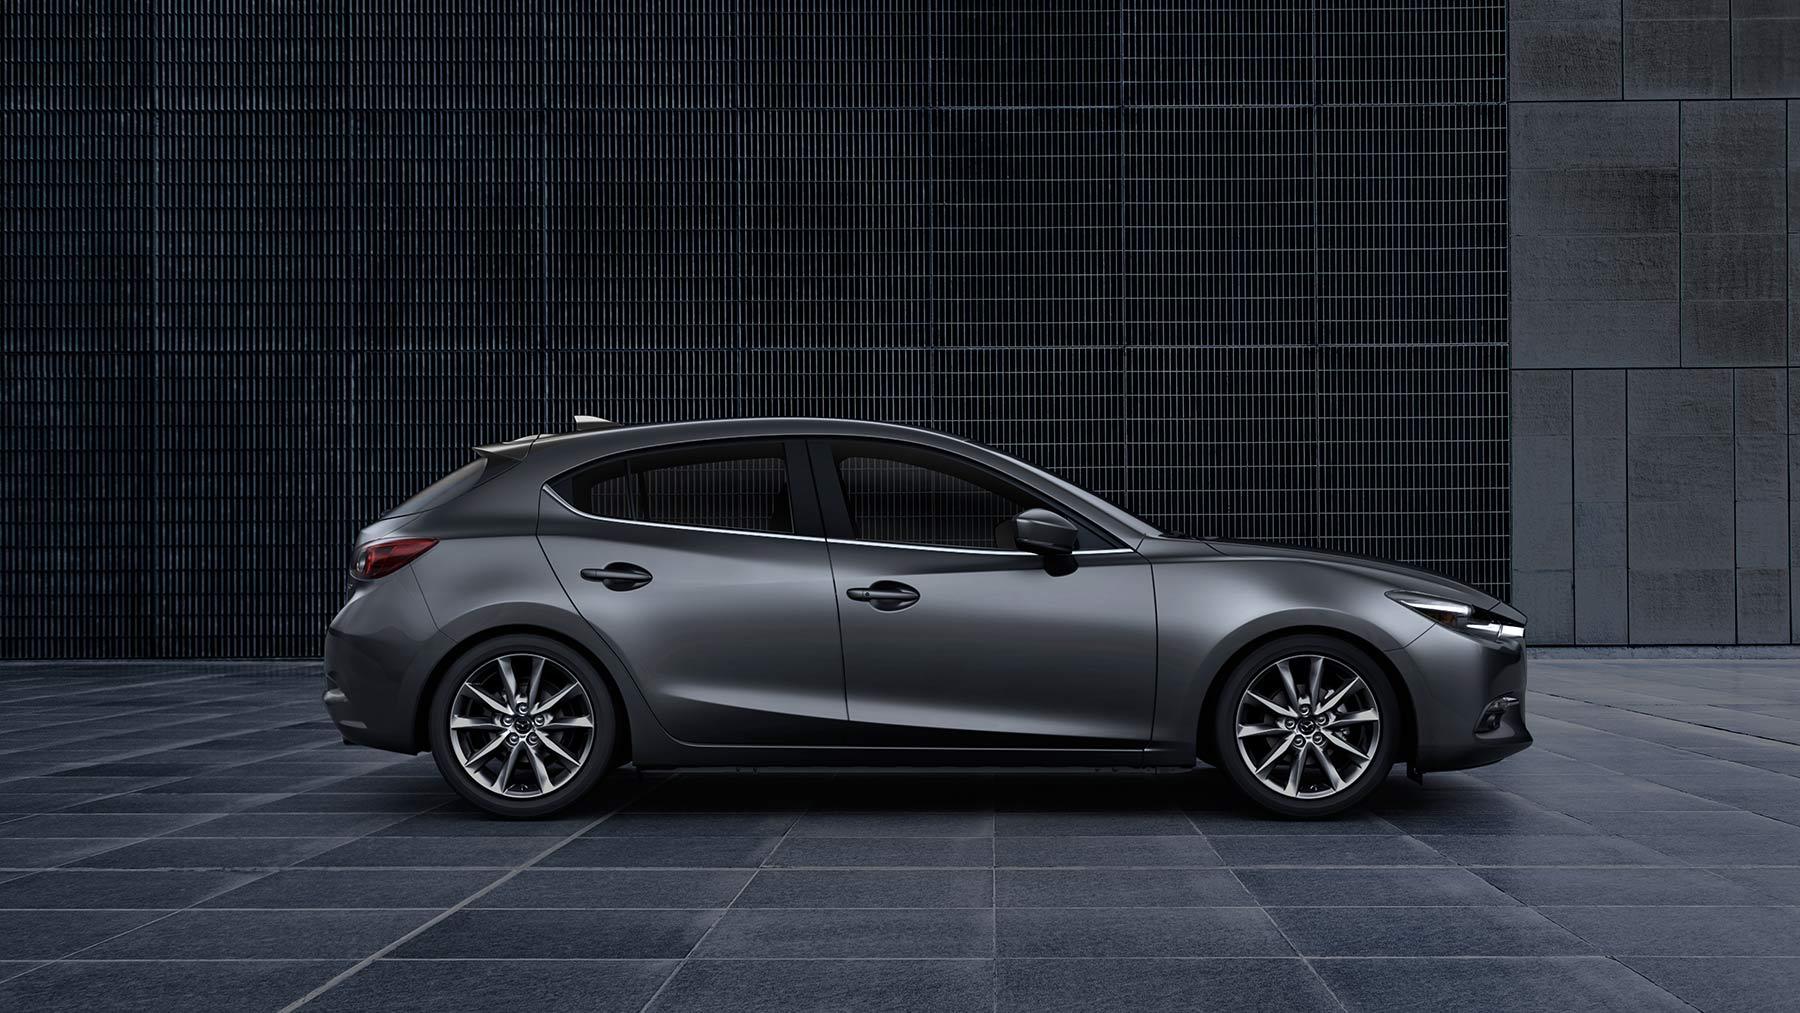 Test Drive a Mazda!